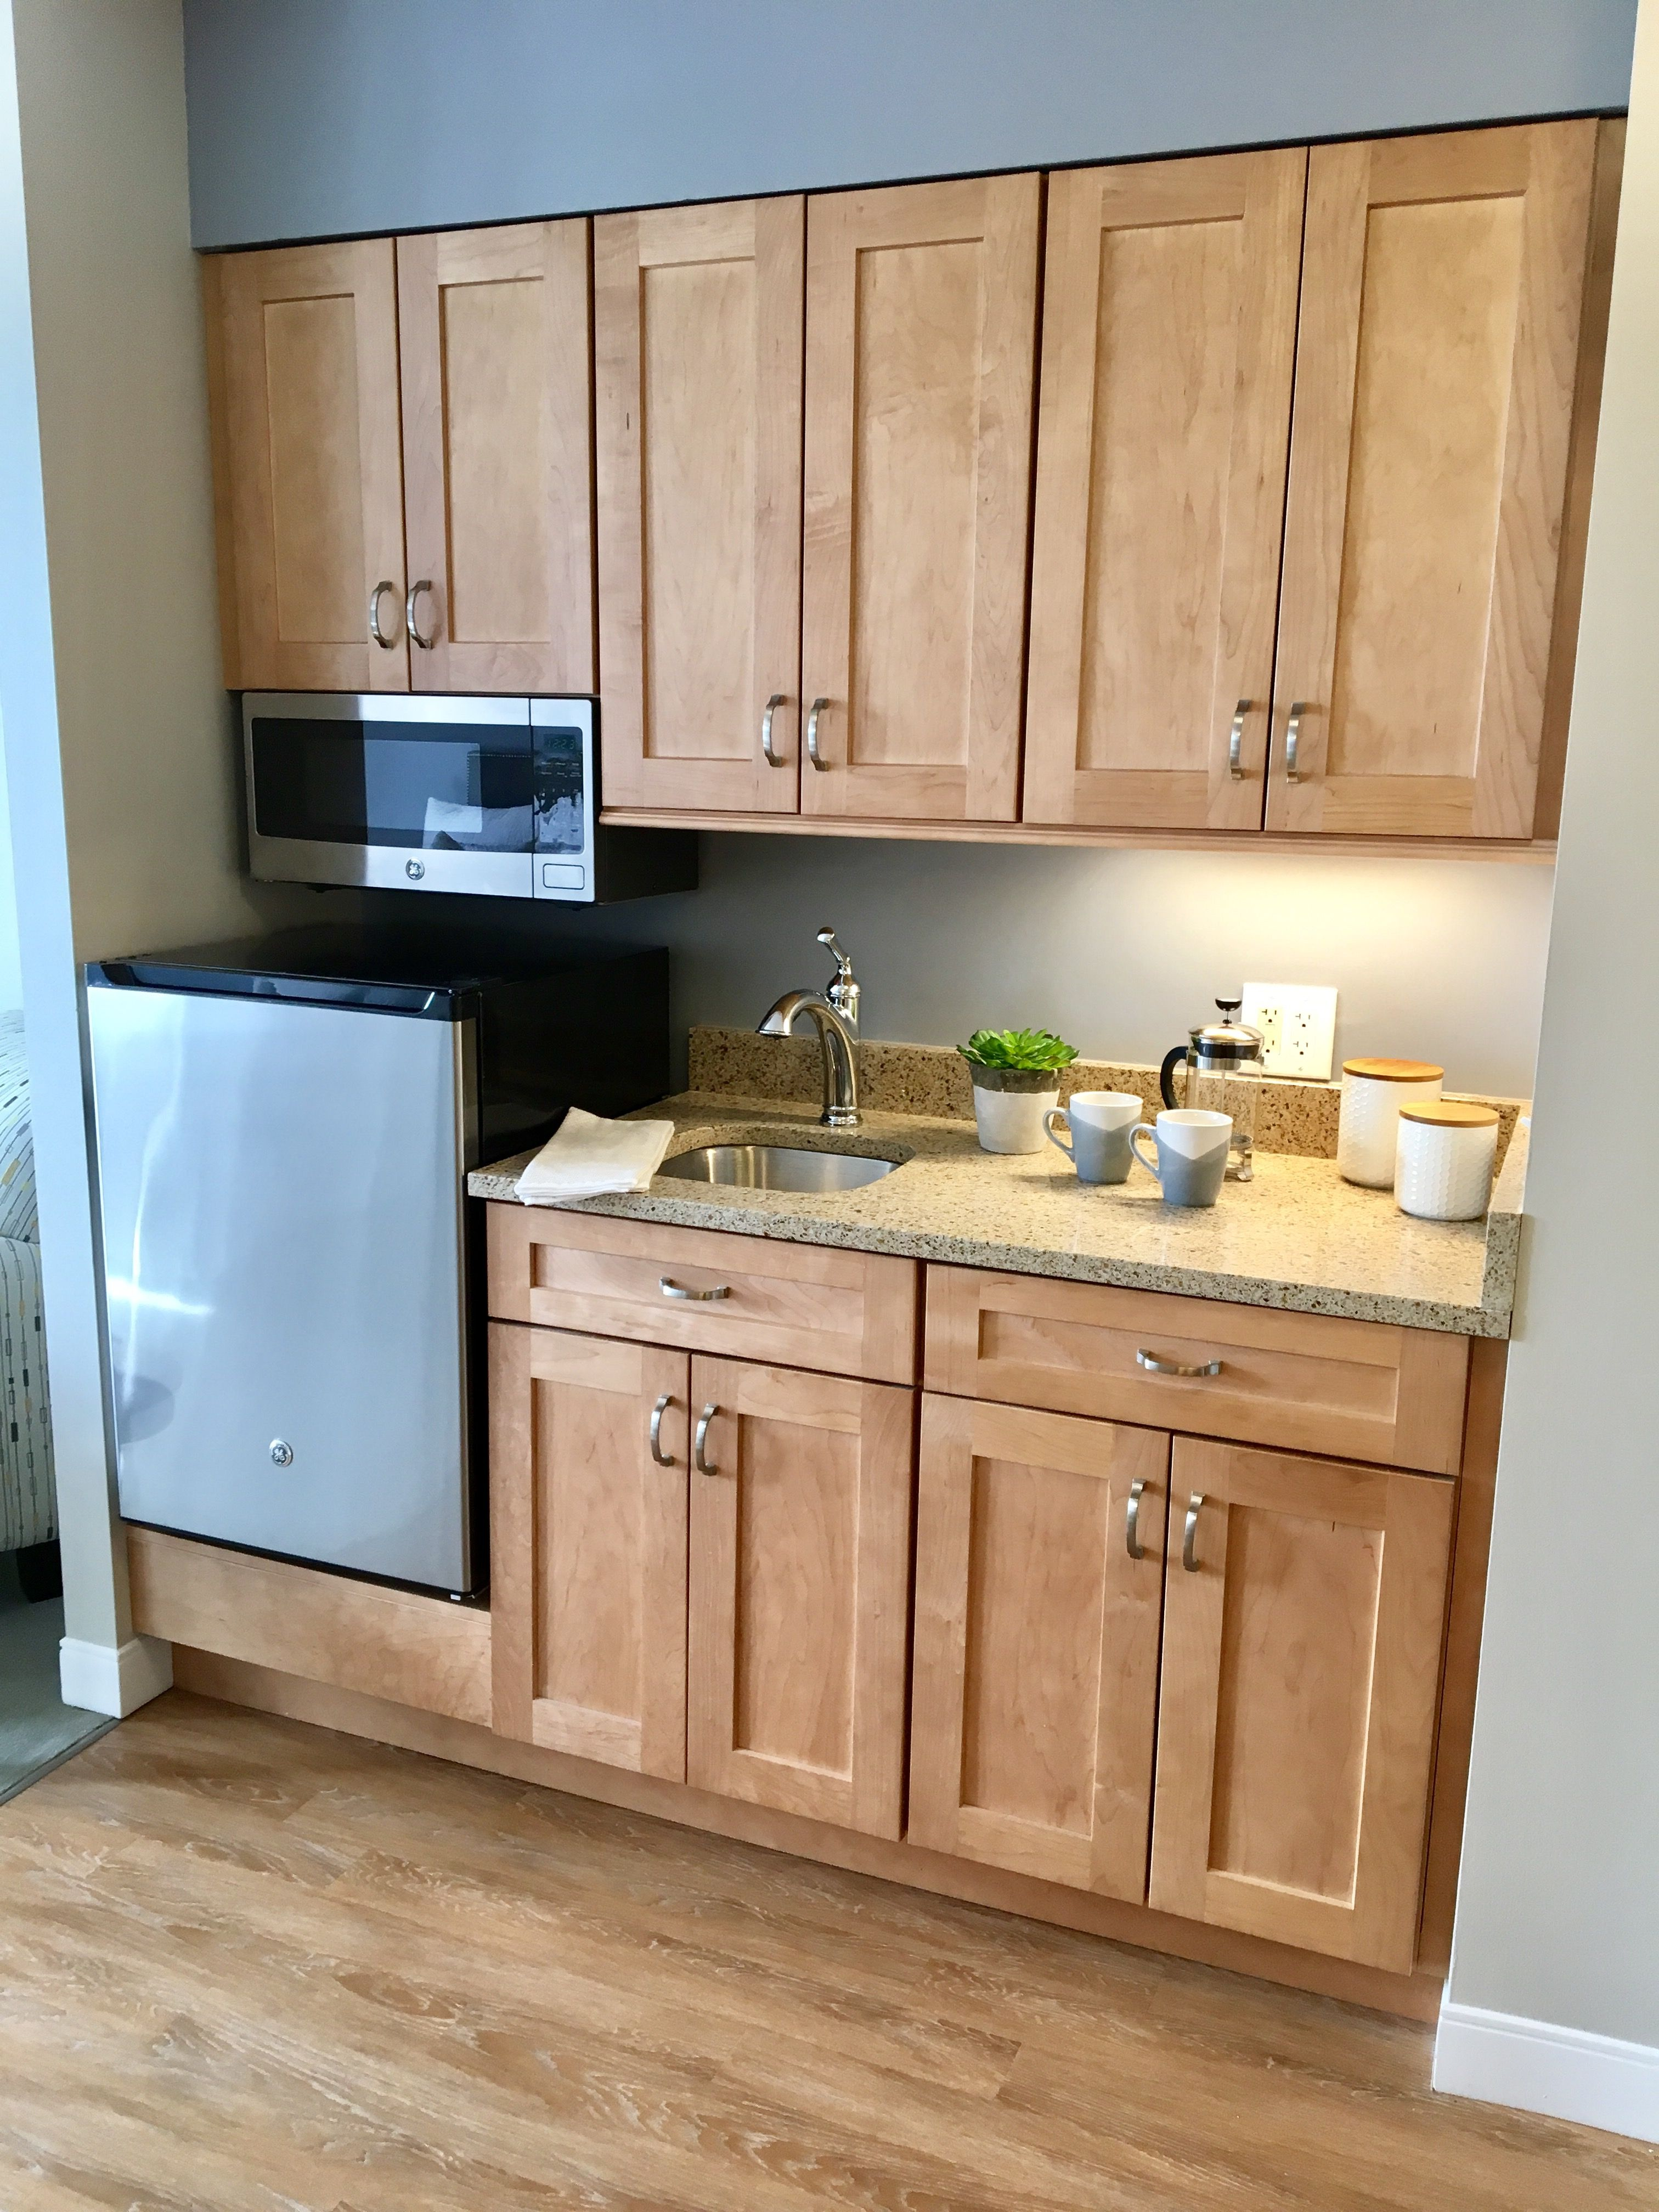 Kitchenette, Light Maple Cabinets, Quartz Countertops